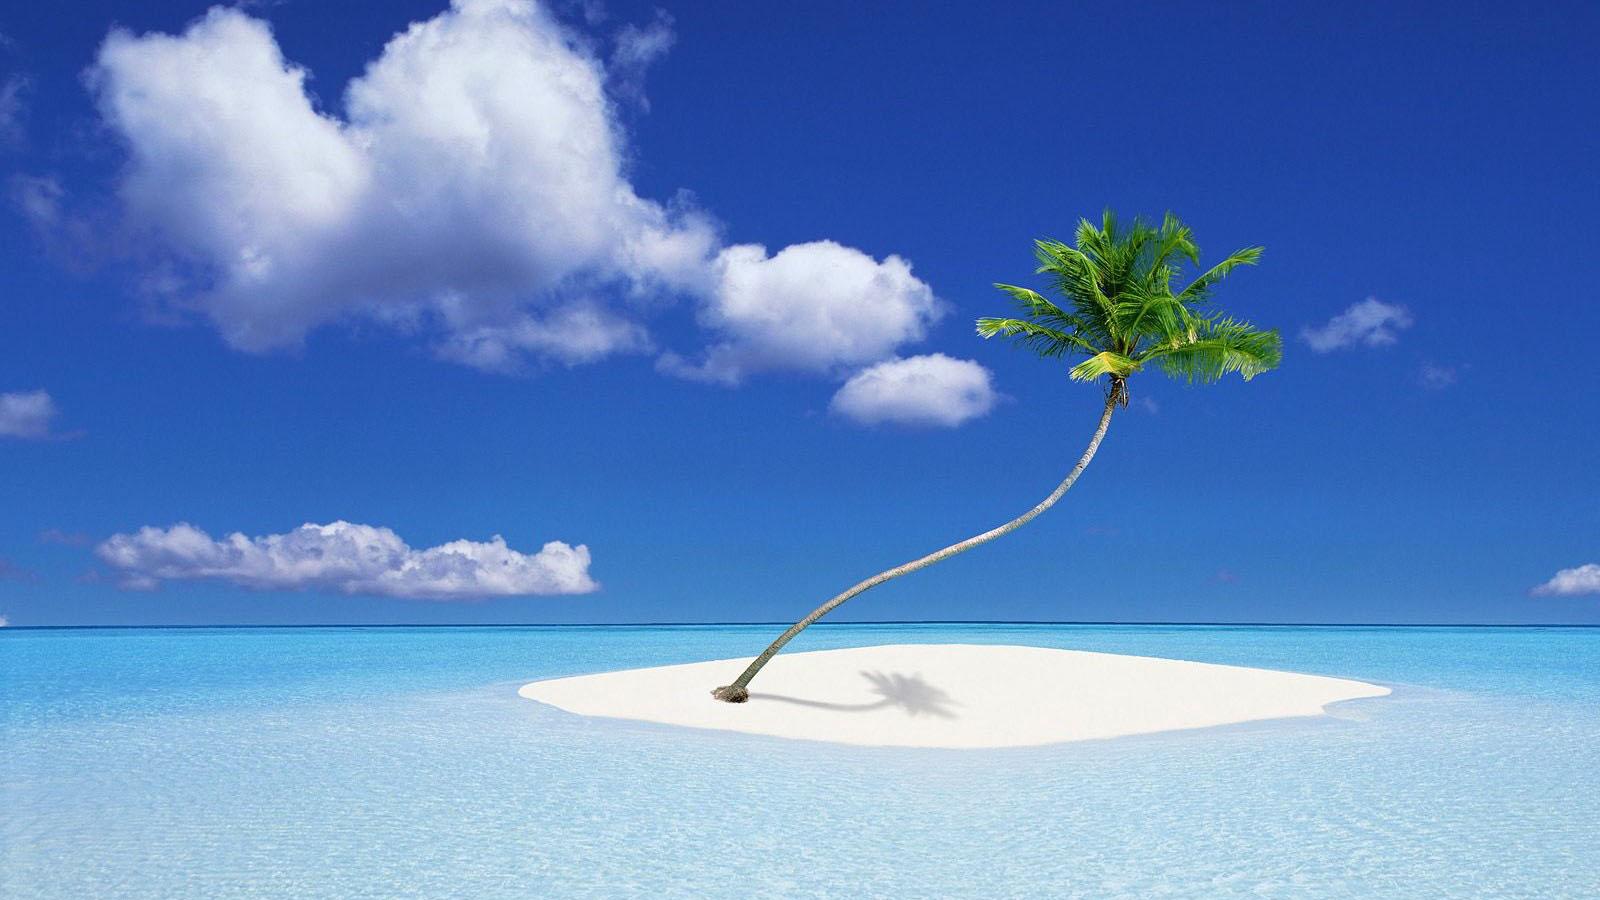 island scenery image desktop